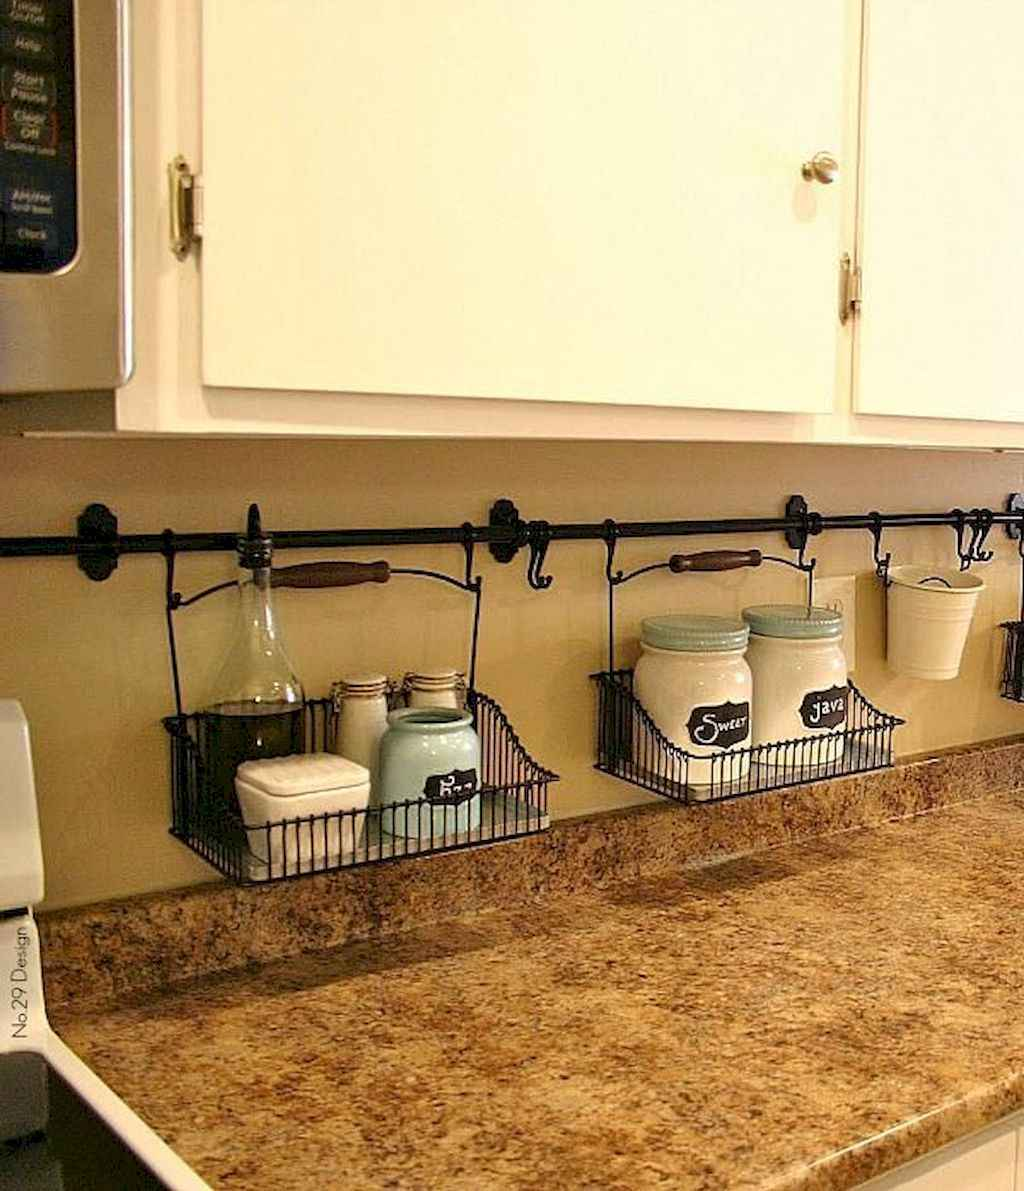 100 smart kitchen organization ideas for first apartment (27)